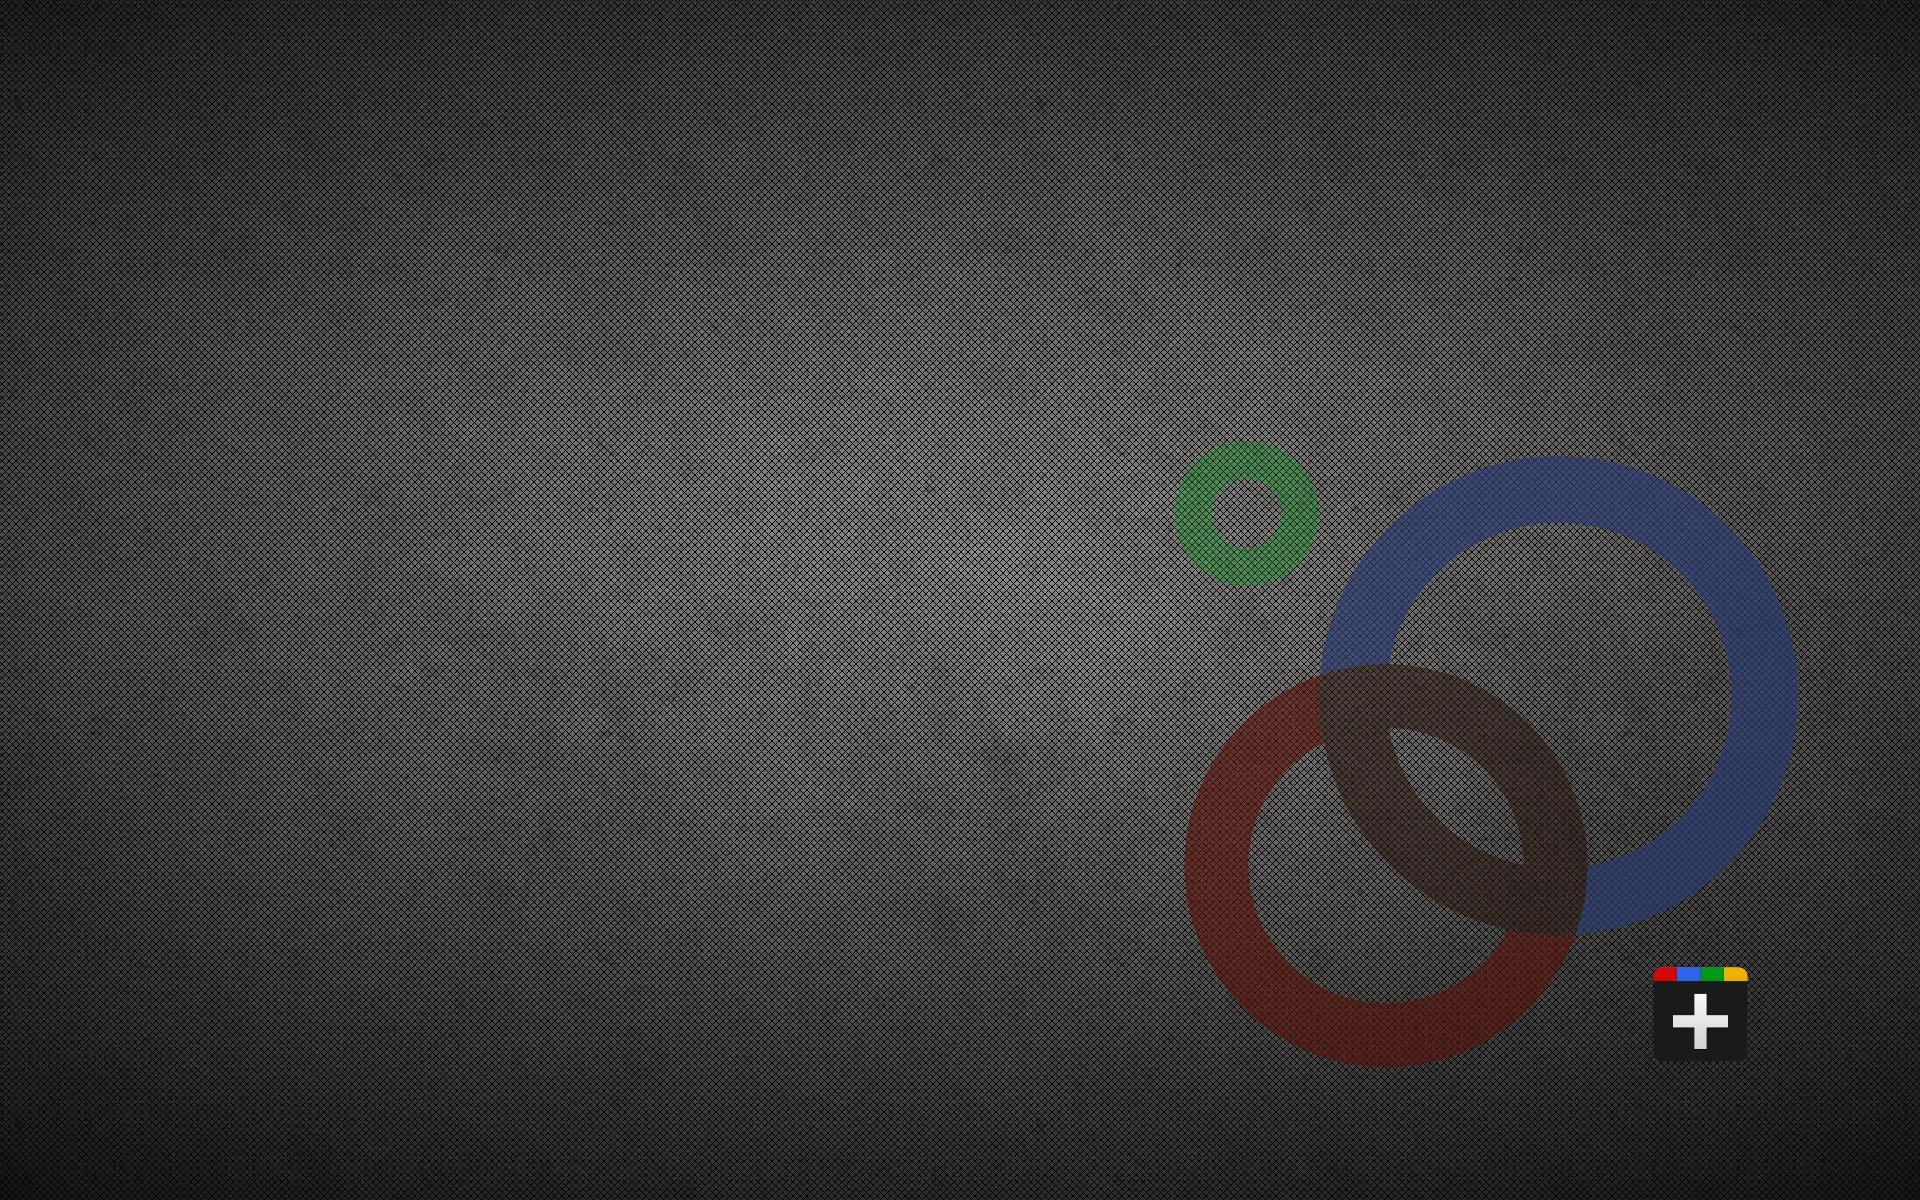 Google Colors Wallpaper Download Link